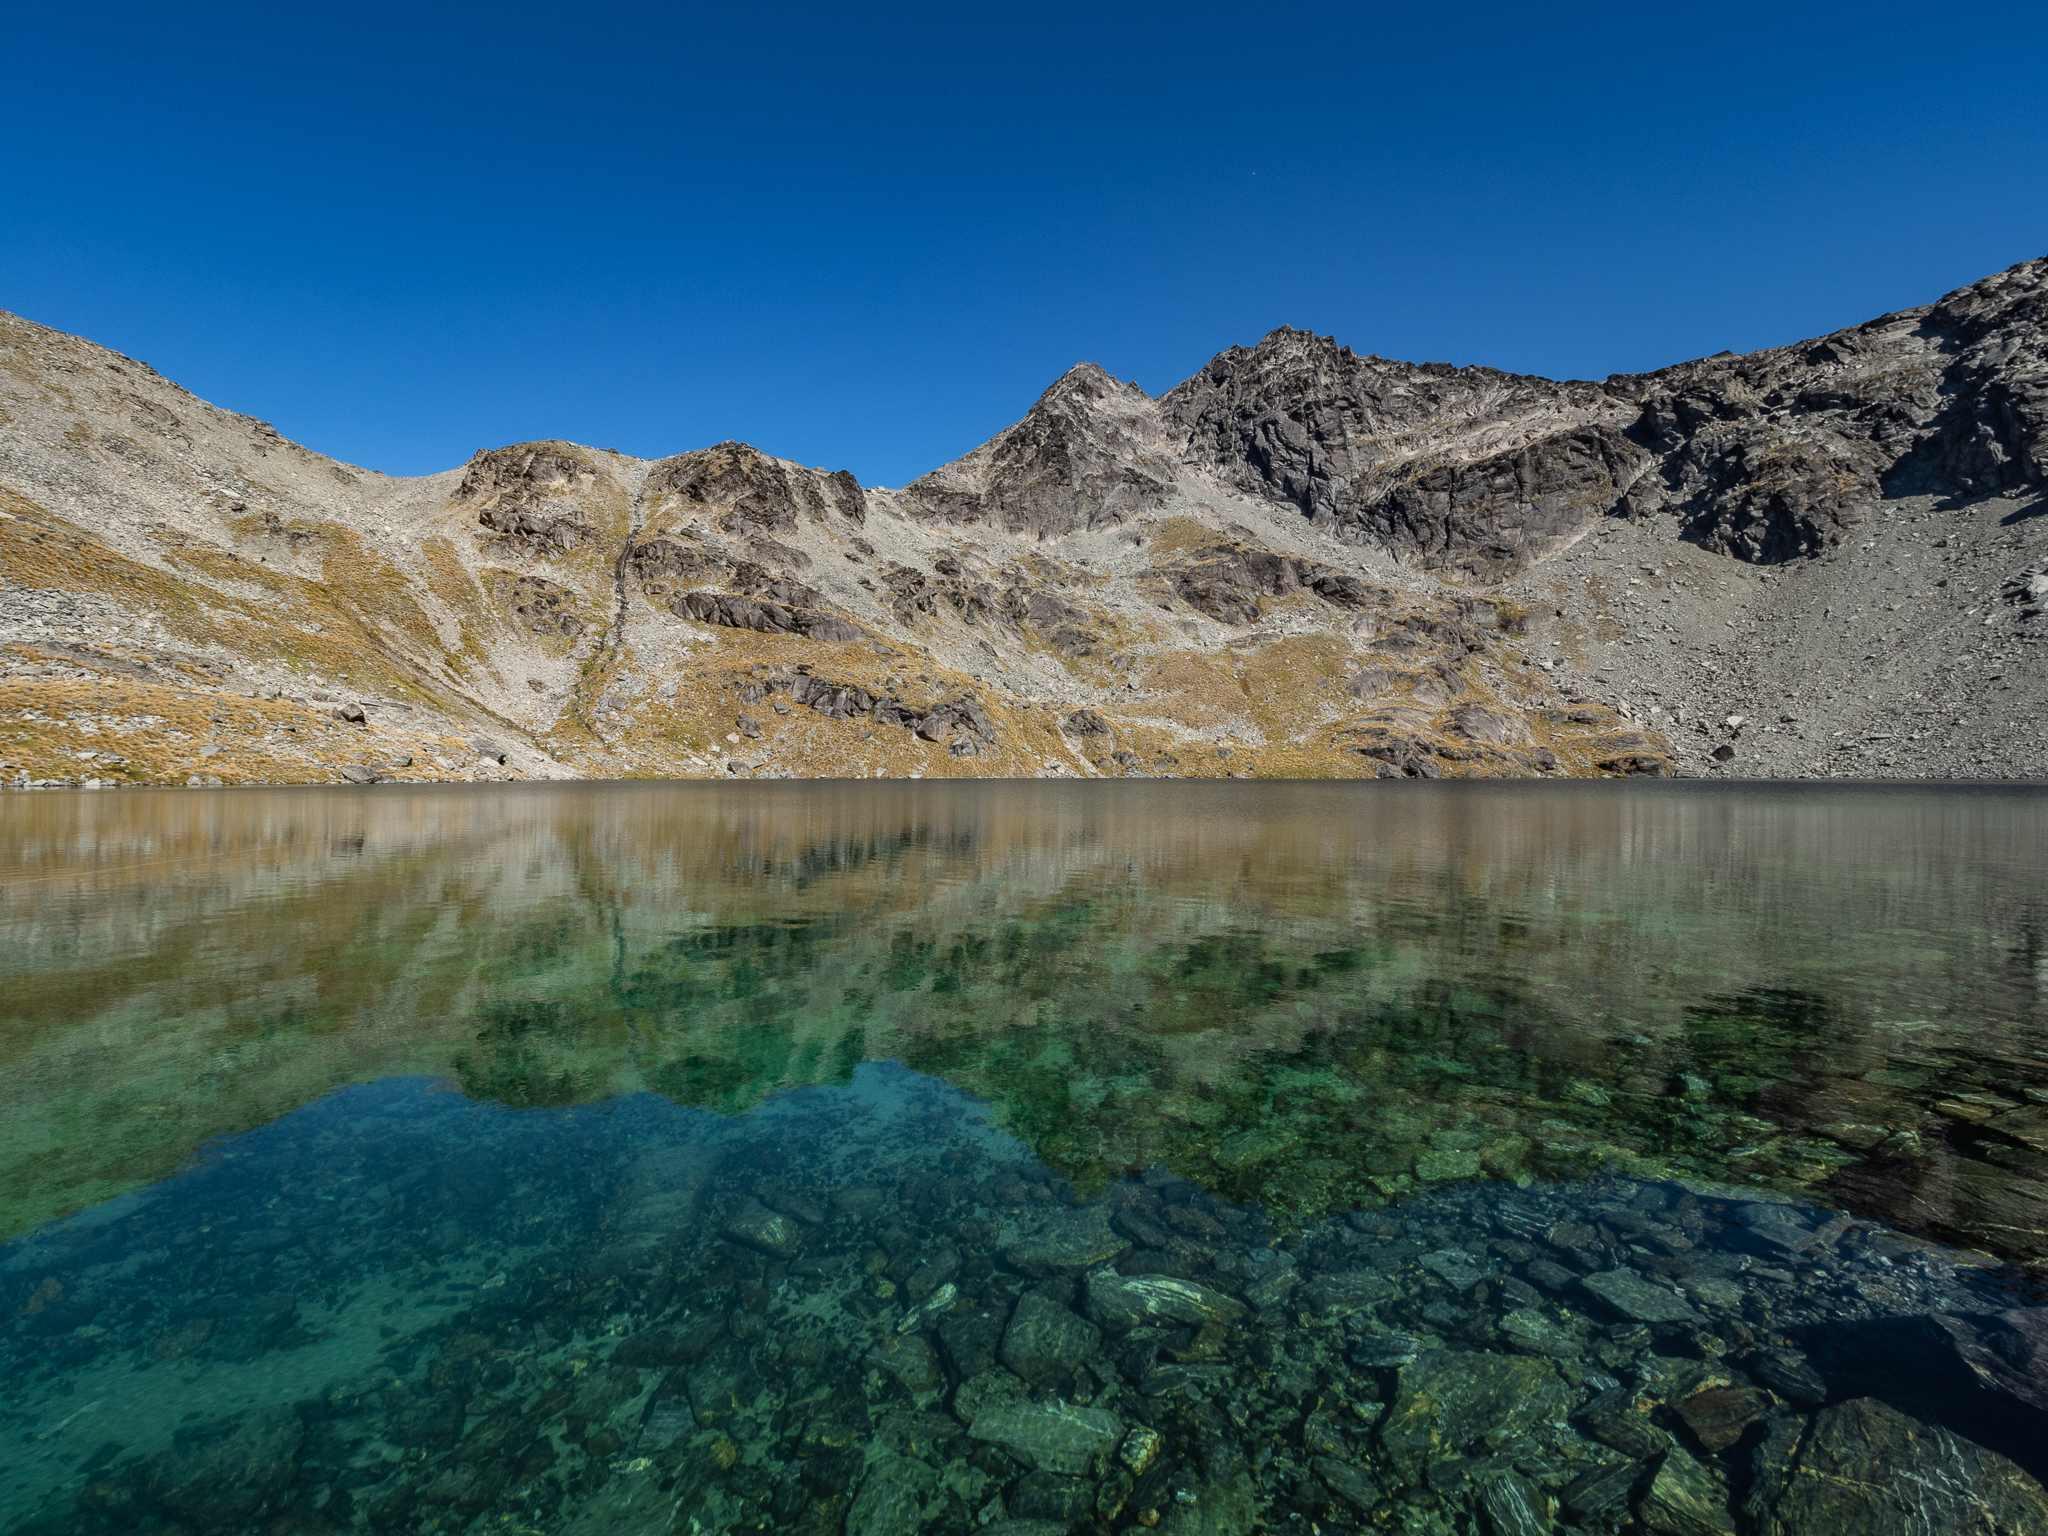 beautiful mountain peaks reflect on the alpine lake below